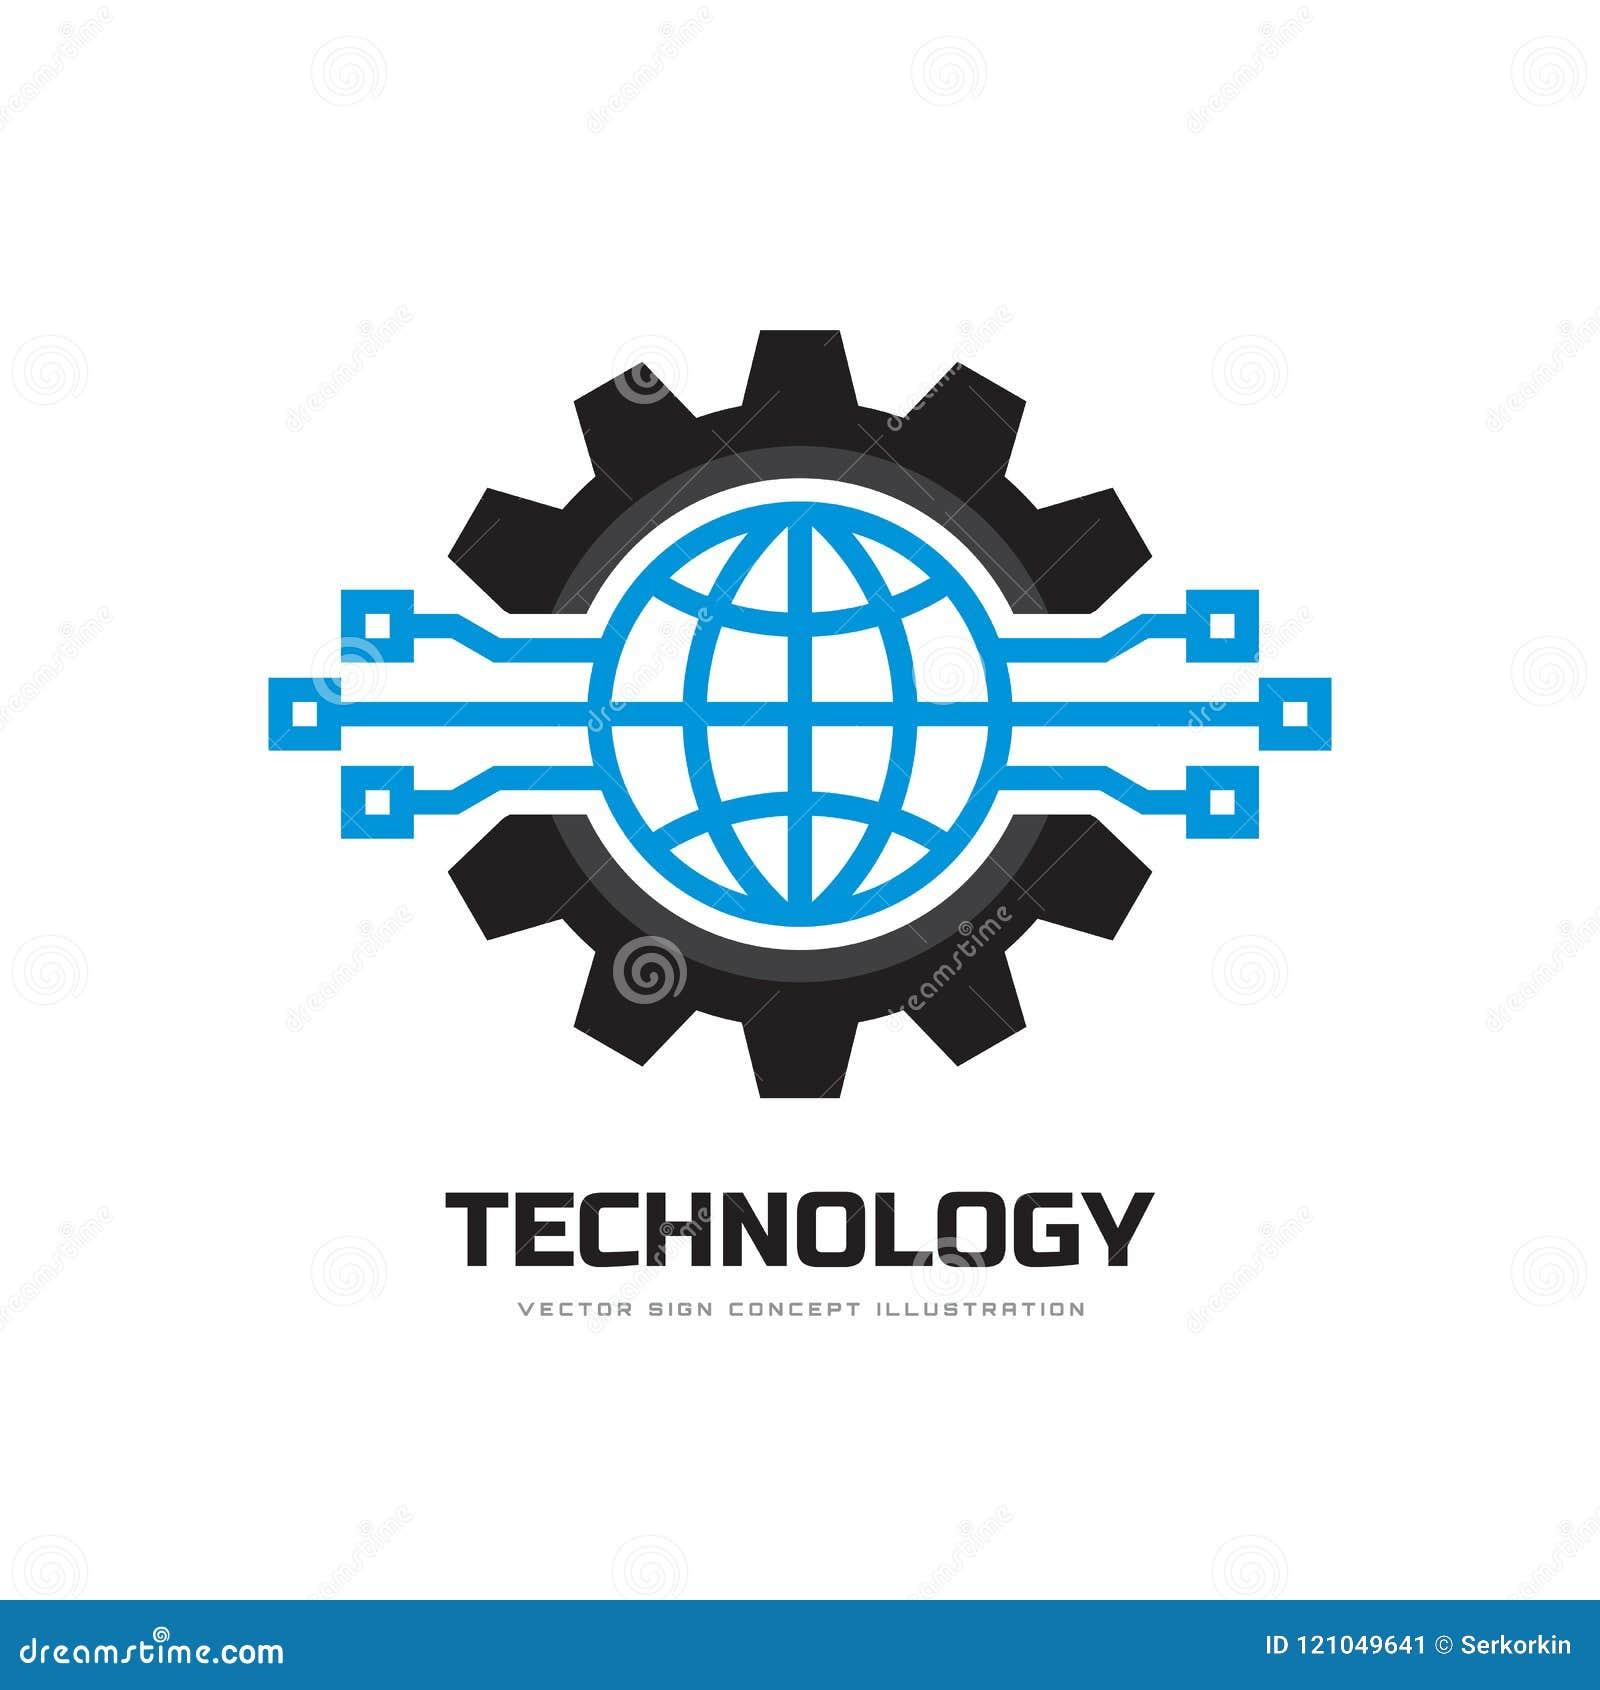 Technology - concept business logo template vector illustration. Globe world and gear symbols. Cogwheel mechanic sign.